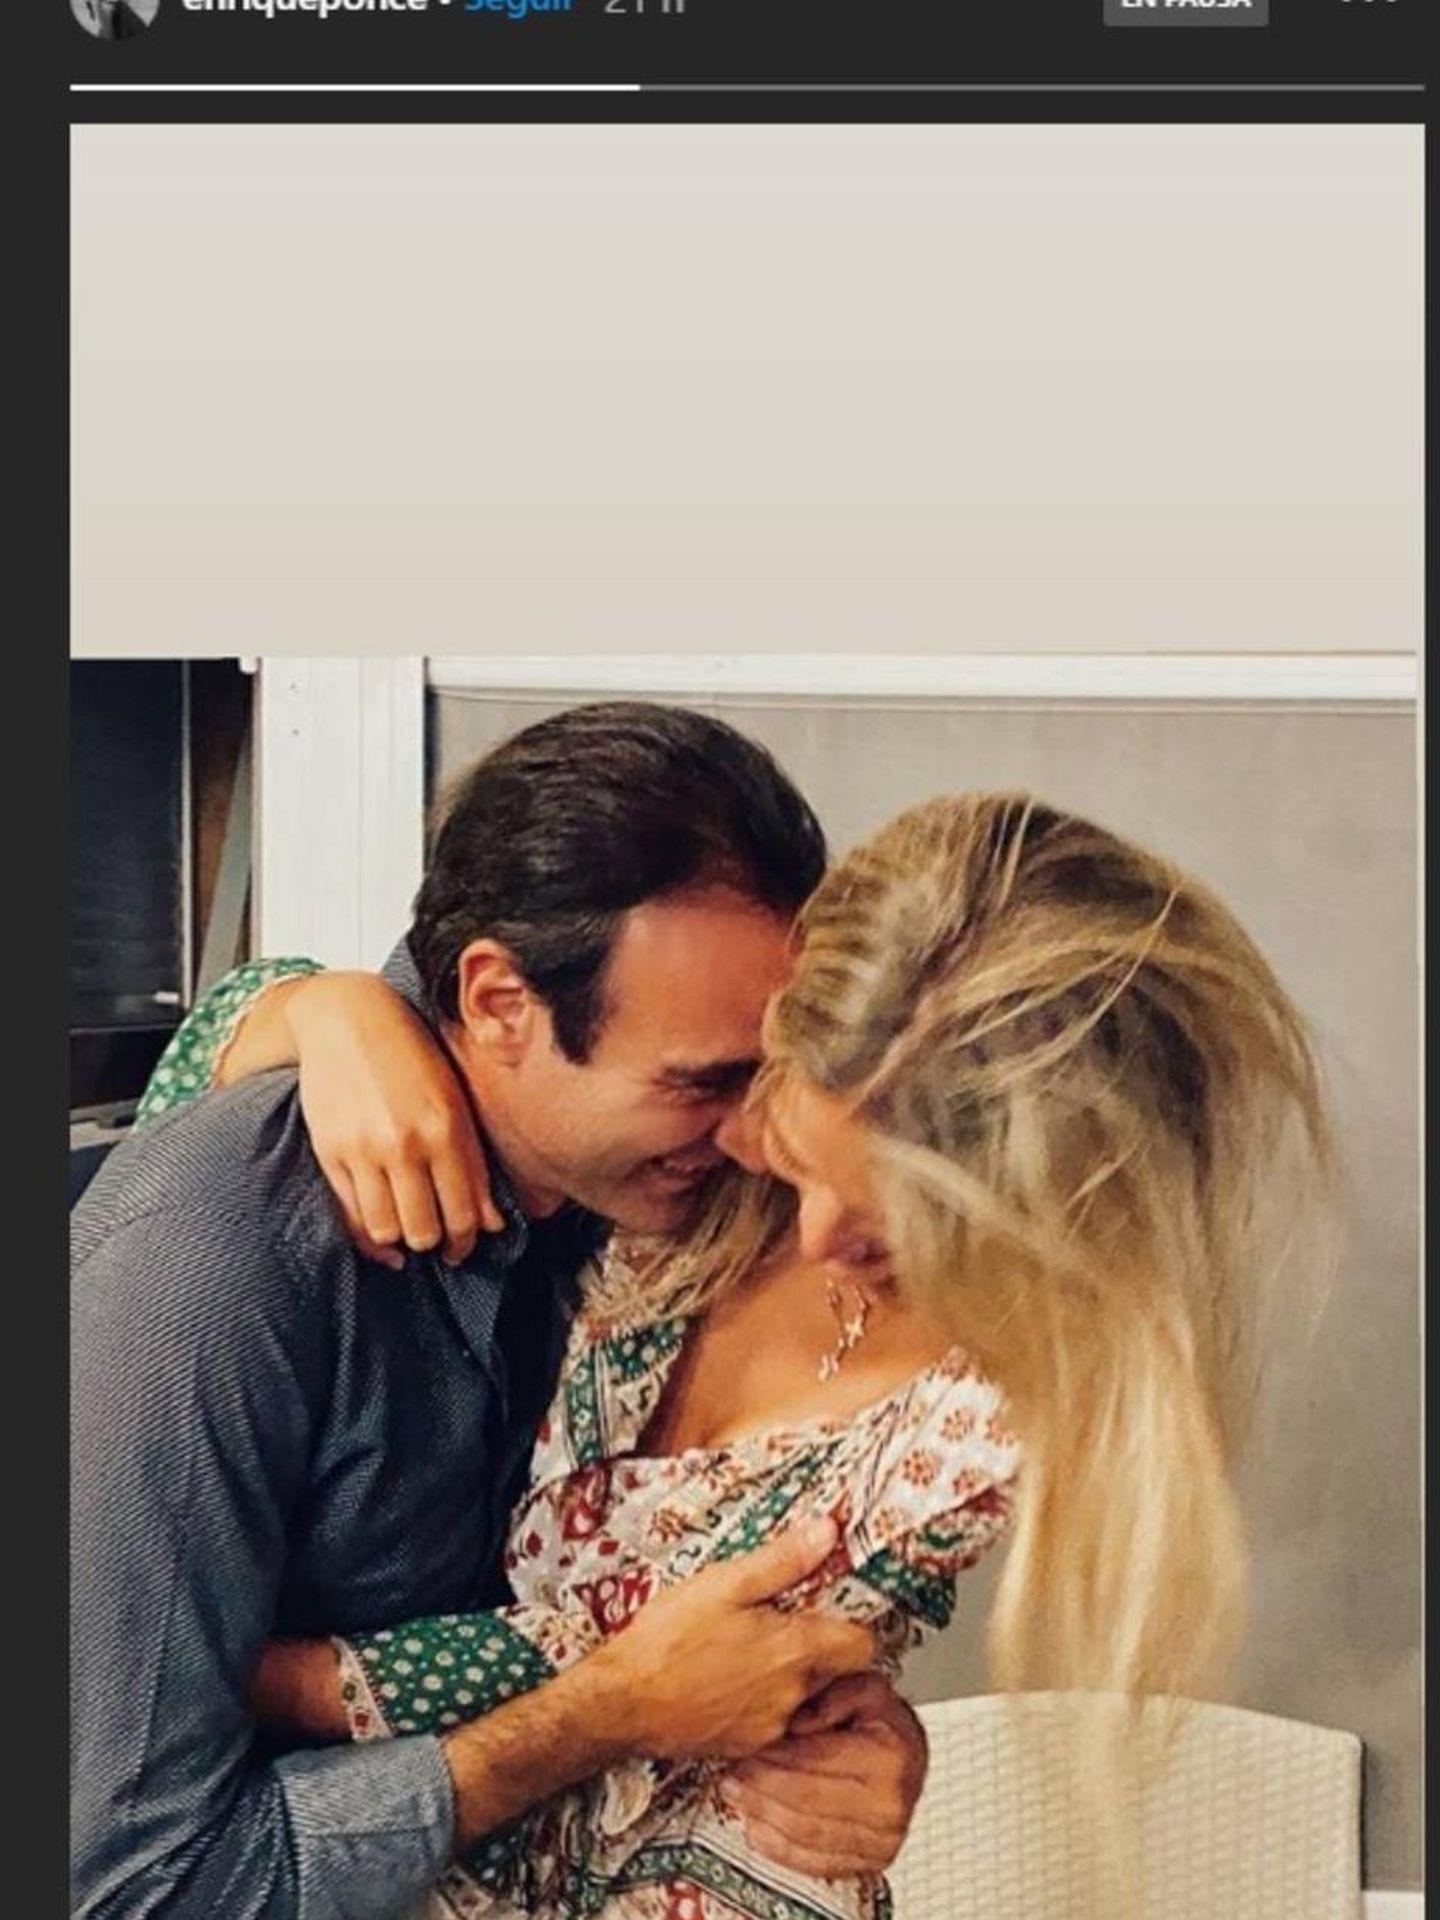 La pareja, en una imagen de Instagram. (RR.SS.)